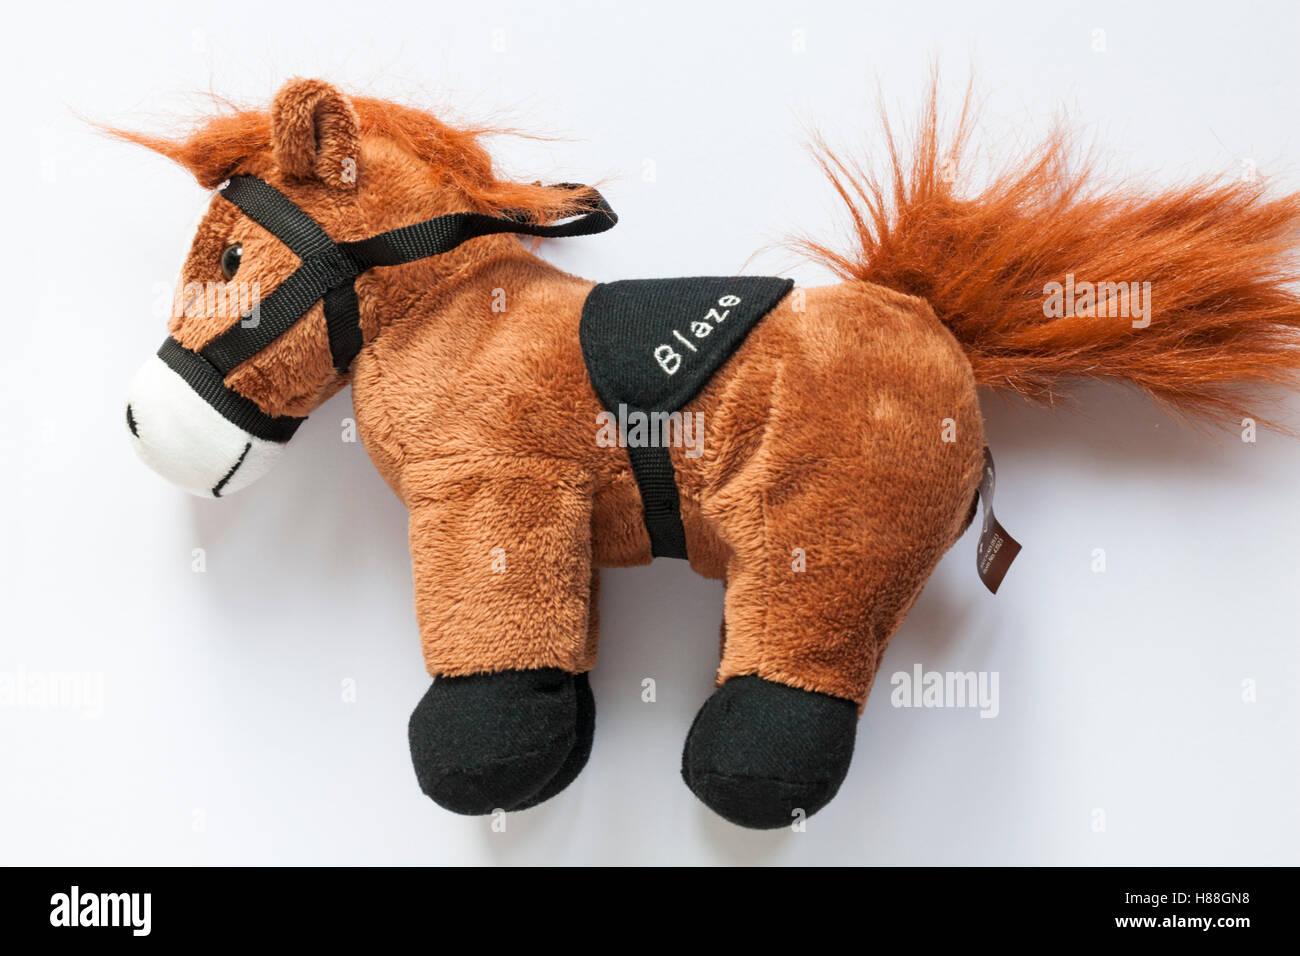 Posh Ponies Blaze soft cuddly toy set on white background - Stock Image